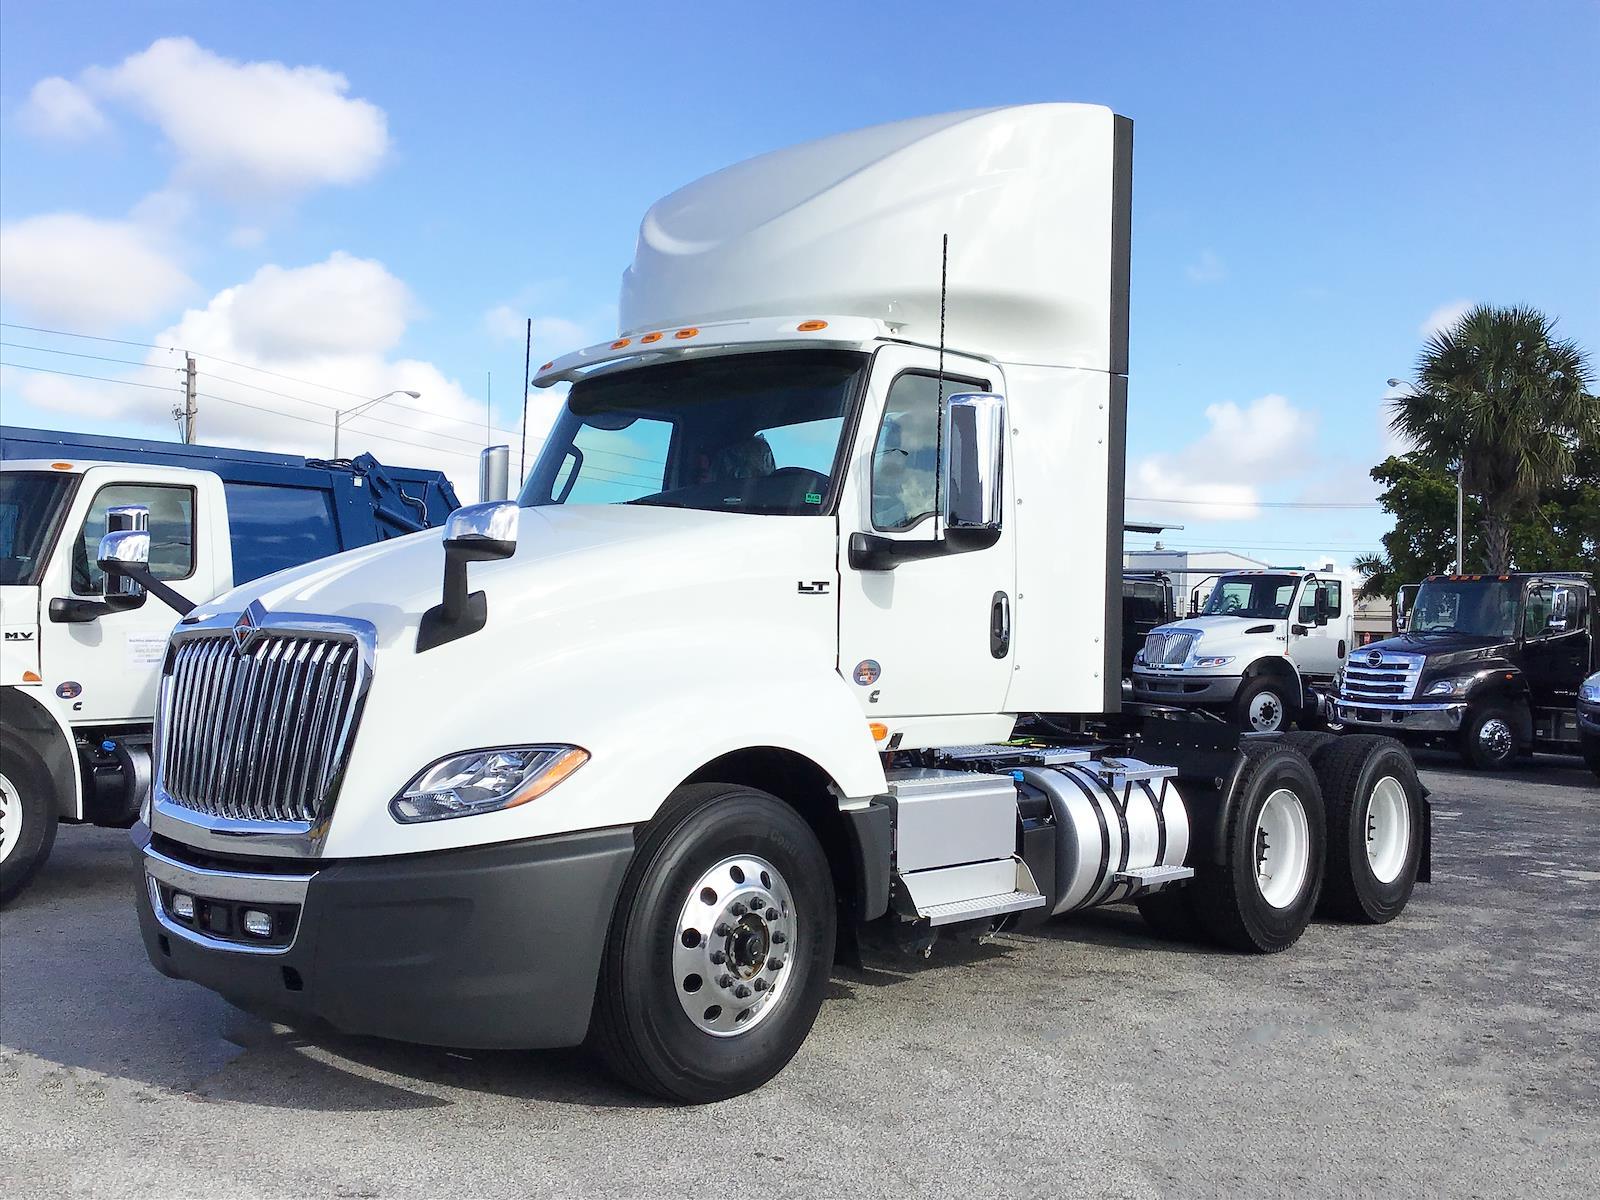 2022 International LT 6x4, Tractor #NN335243 - photo 1